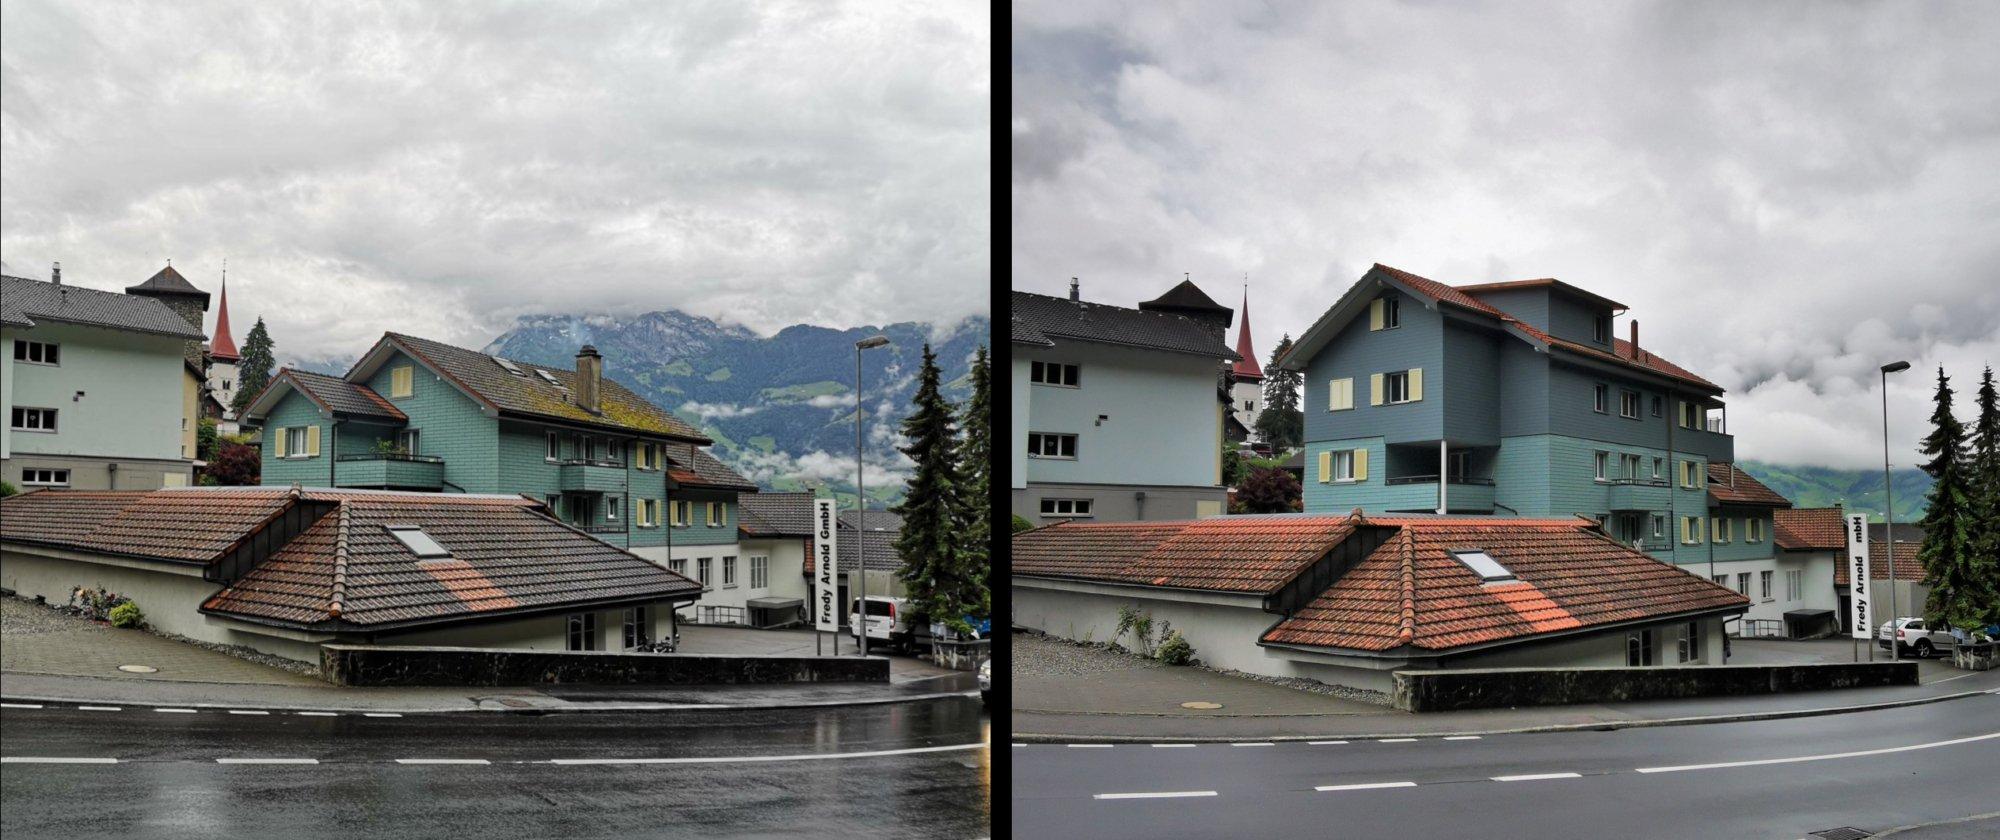 Altes Gebäude links, Mehrfamilienhaus mit Aufstockung rechts